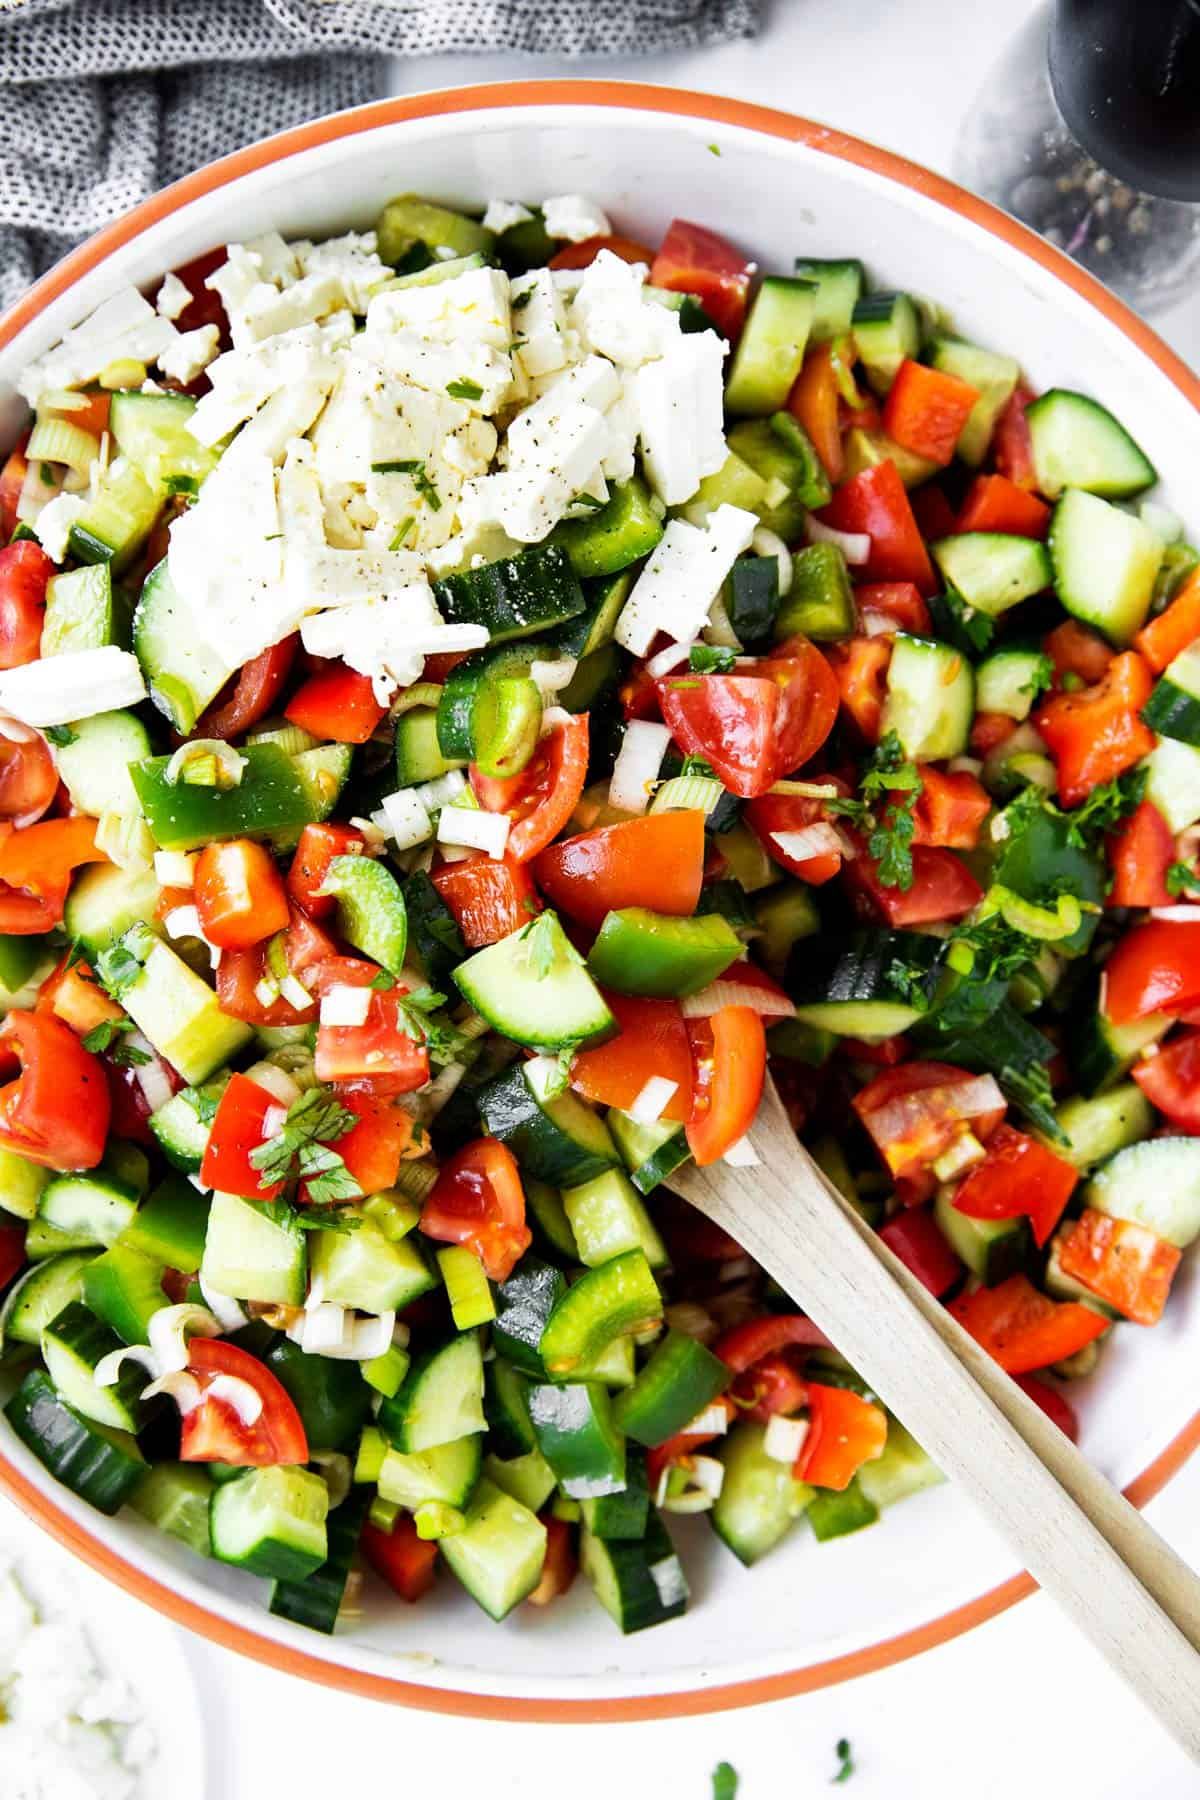 top down view on a salad bowl with shopska salad